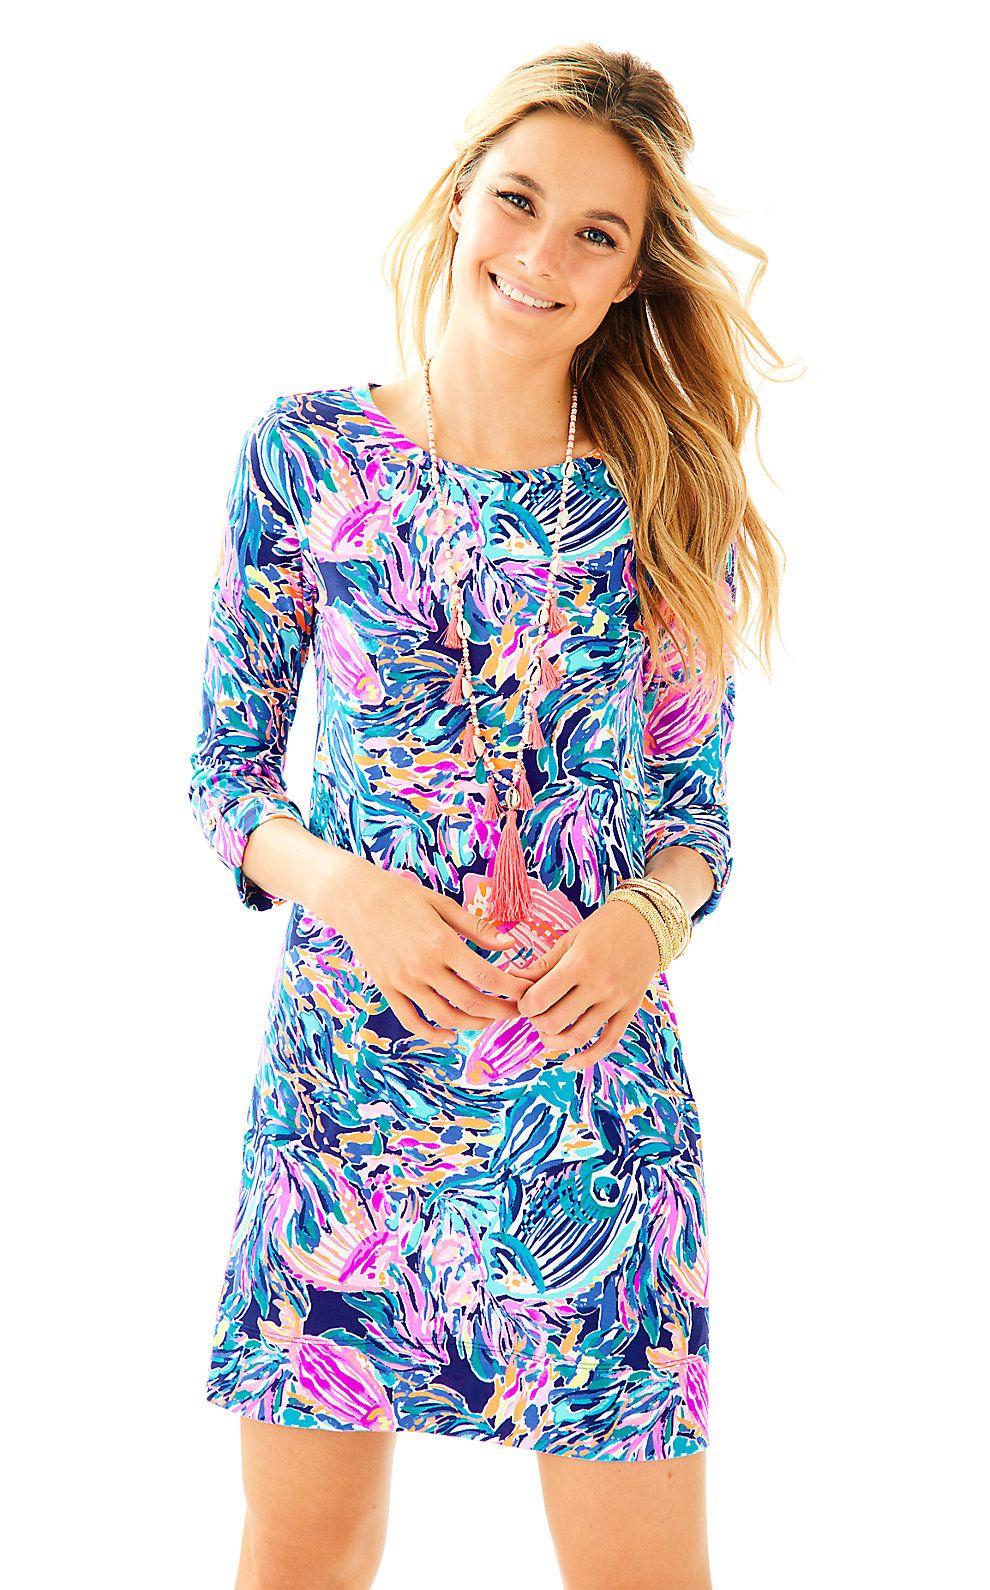 6b9ac6c5615efc Linden A-Line T-Shirt Dress | Products | Dresses, Shirt dress, Shirts